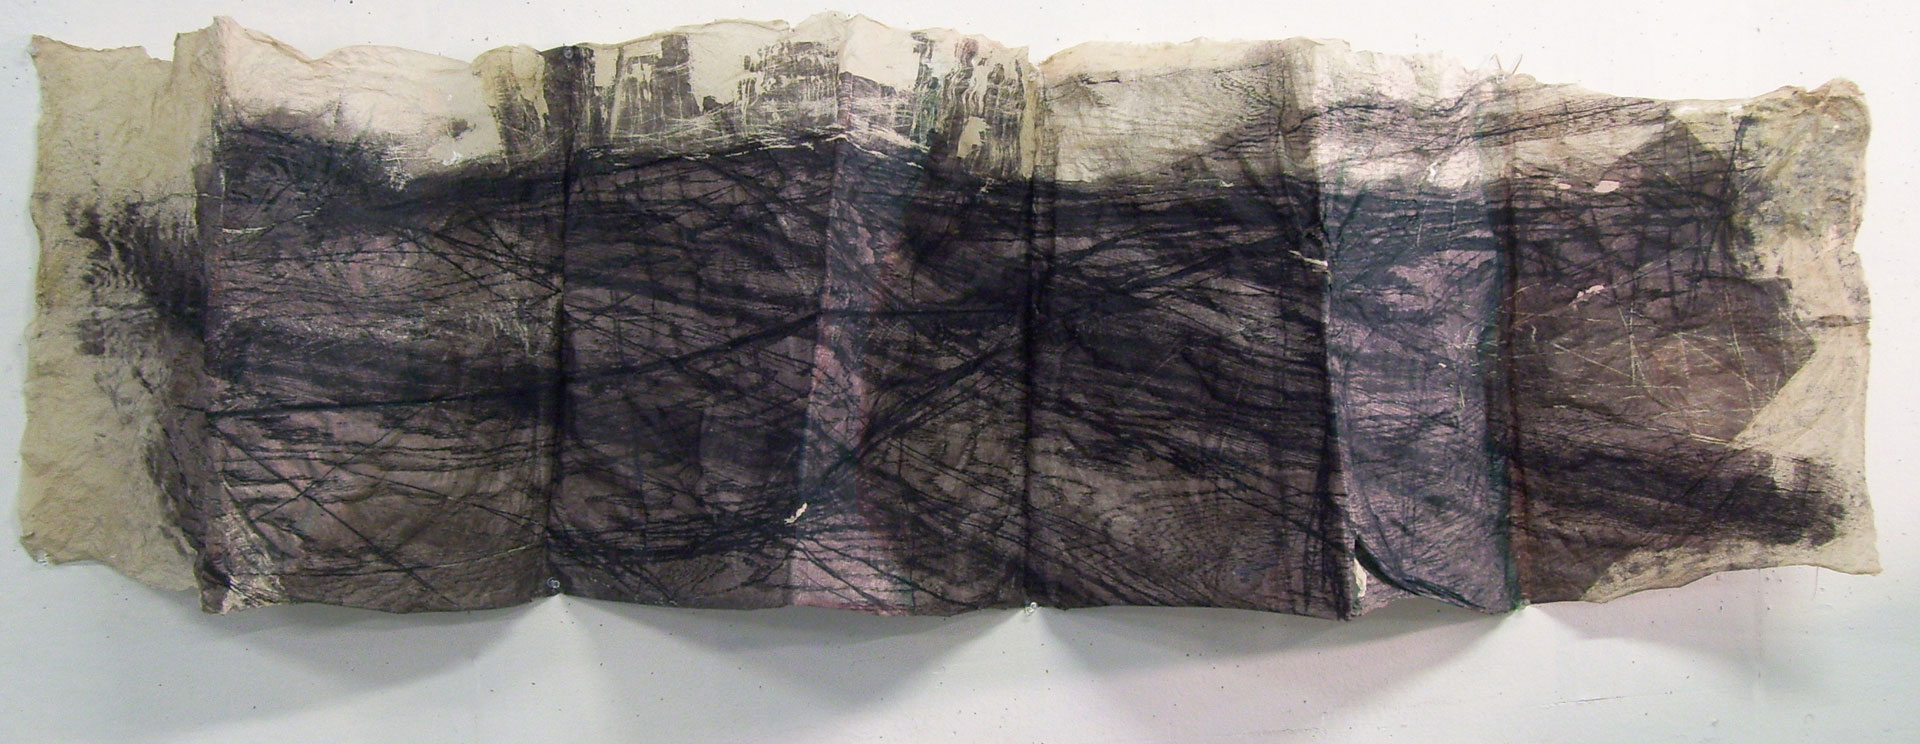 "Folded Landscape, 2010, Handmade Paper, Intaglio Wiped Woodcut, 56"" x 22"""